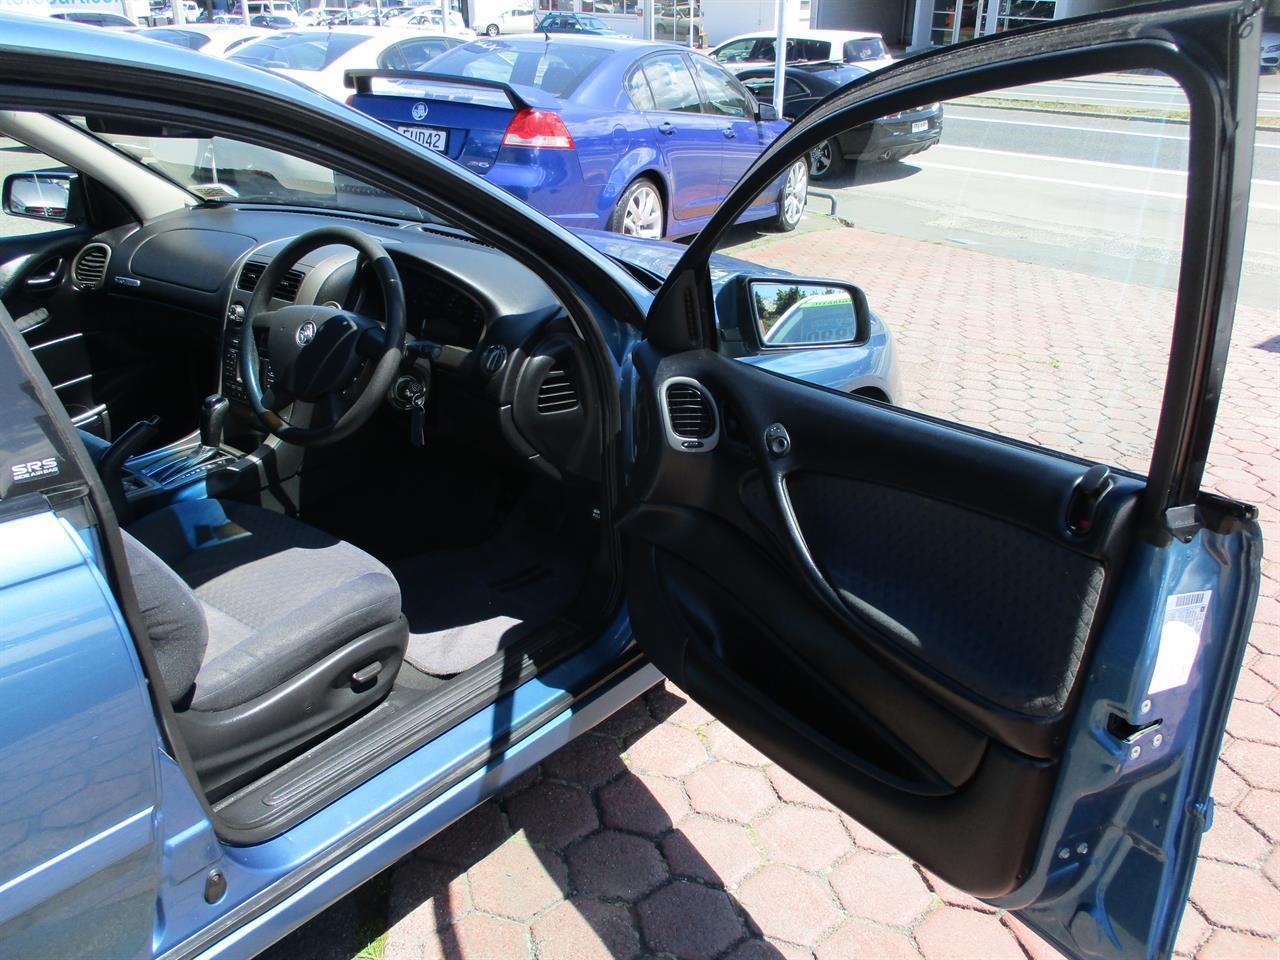 image-13, 2005 Holden Commodore VZ Acclaim at Dunedin